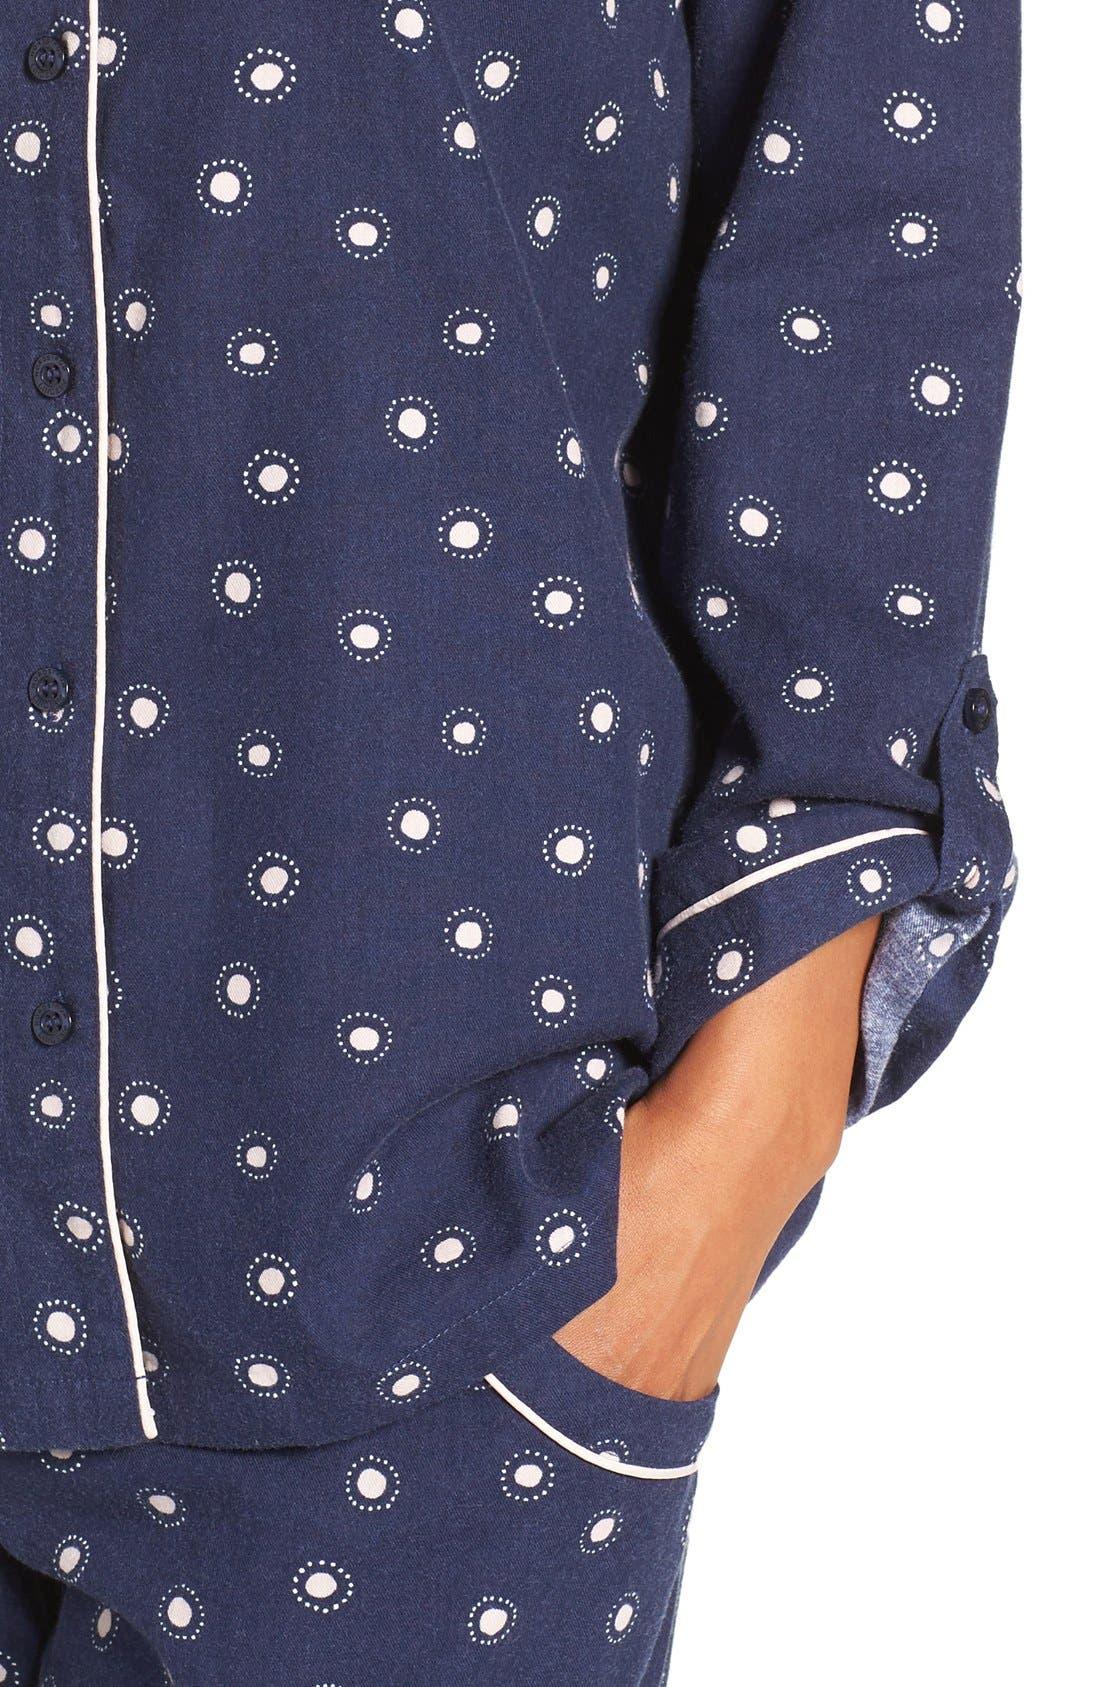 Cotton Twill Pajamas,                             Alternate thumbnail 17, color,